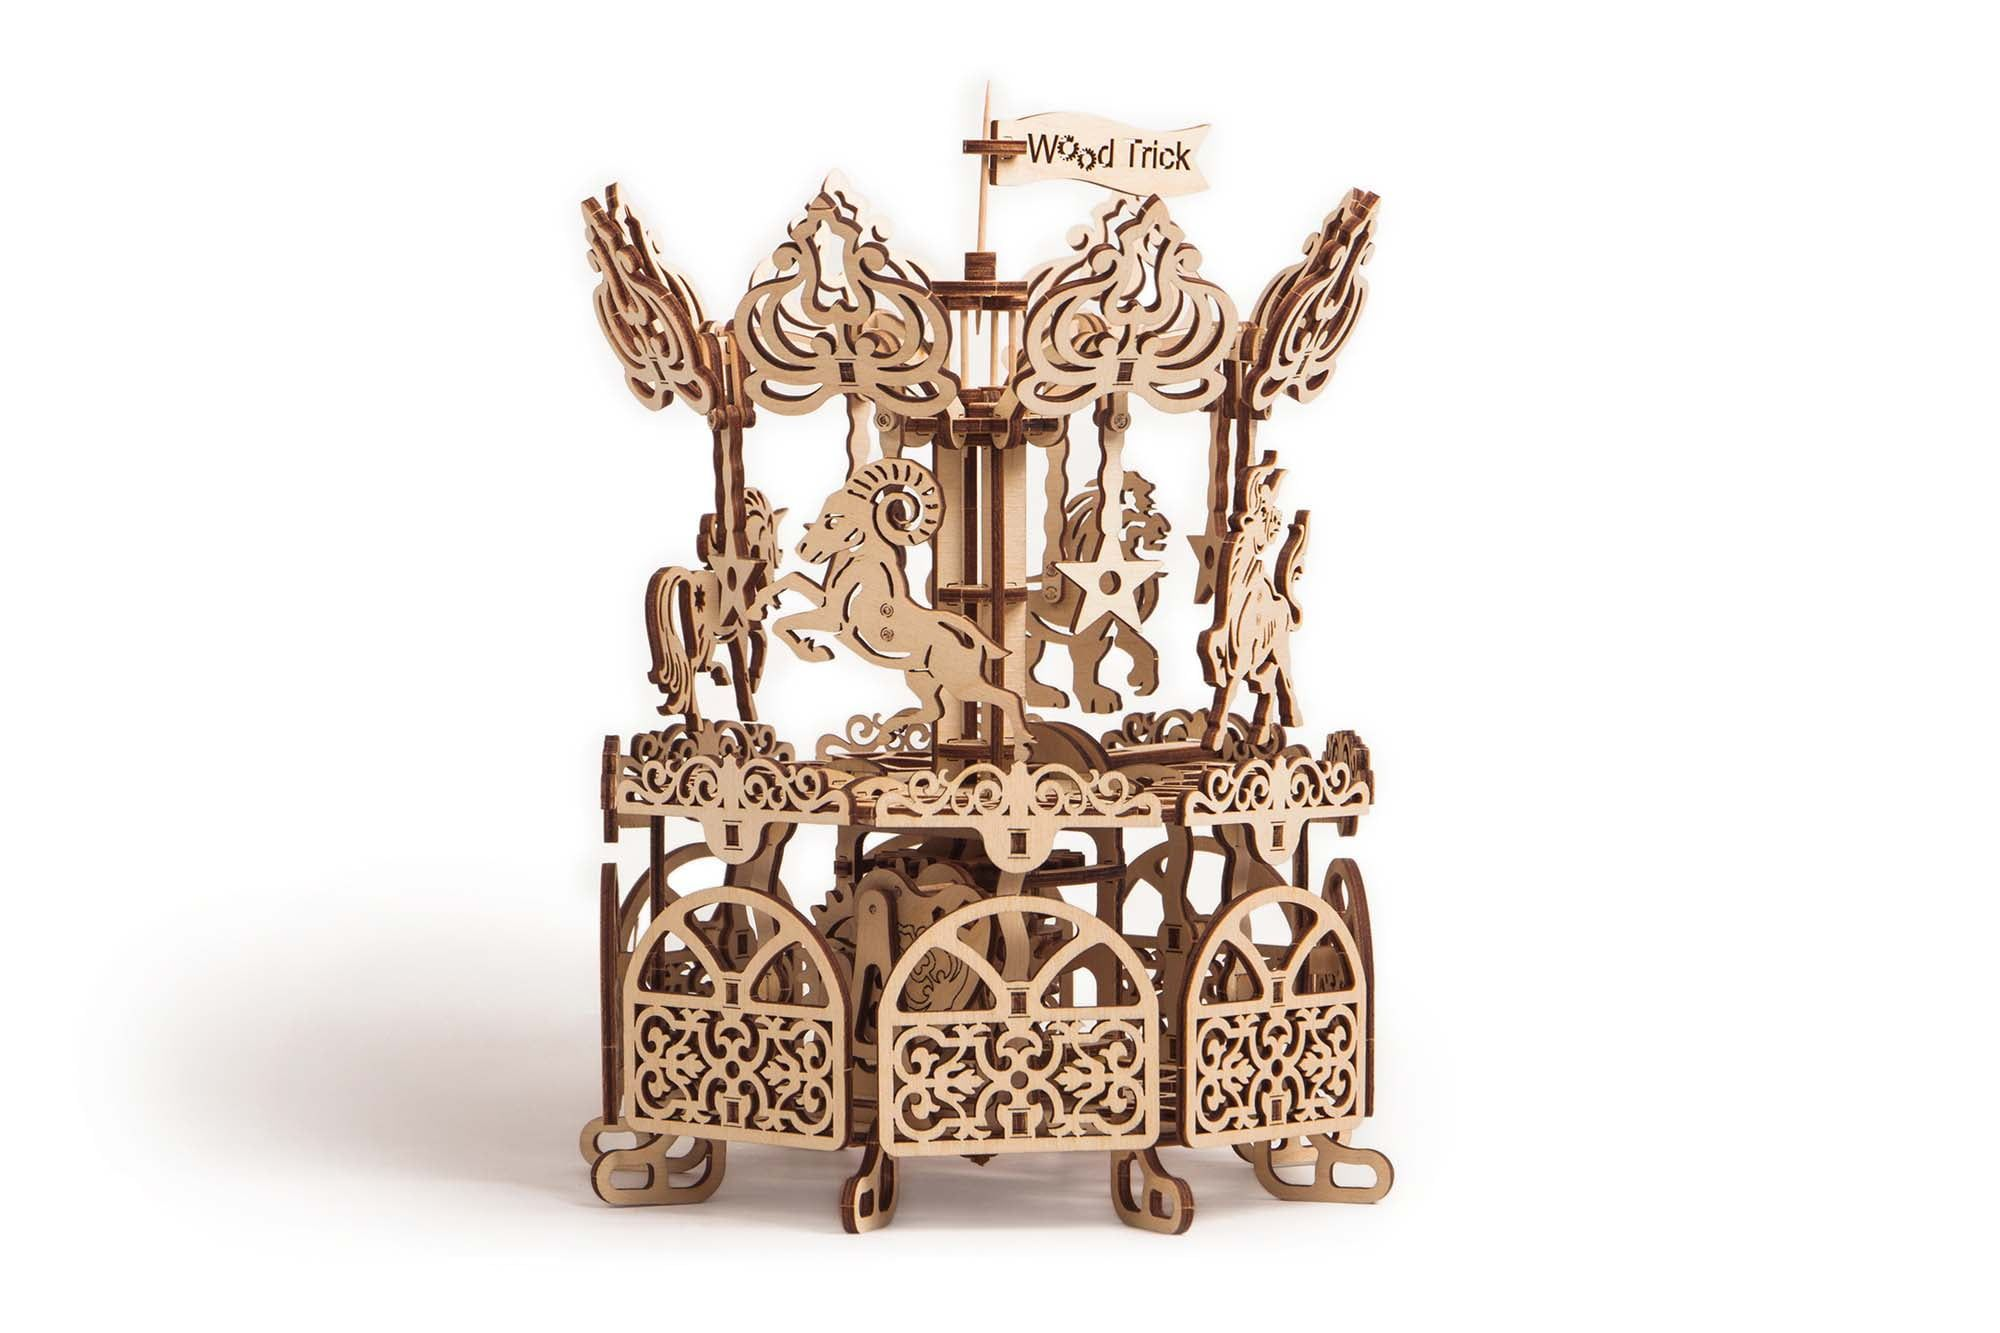 Wood Trick Carousel